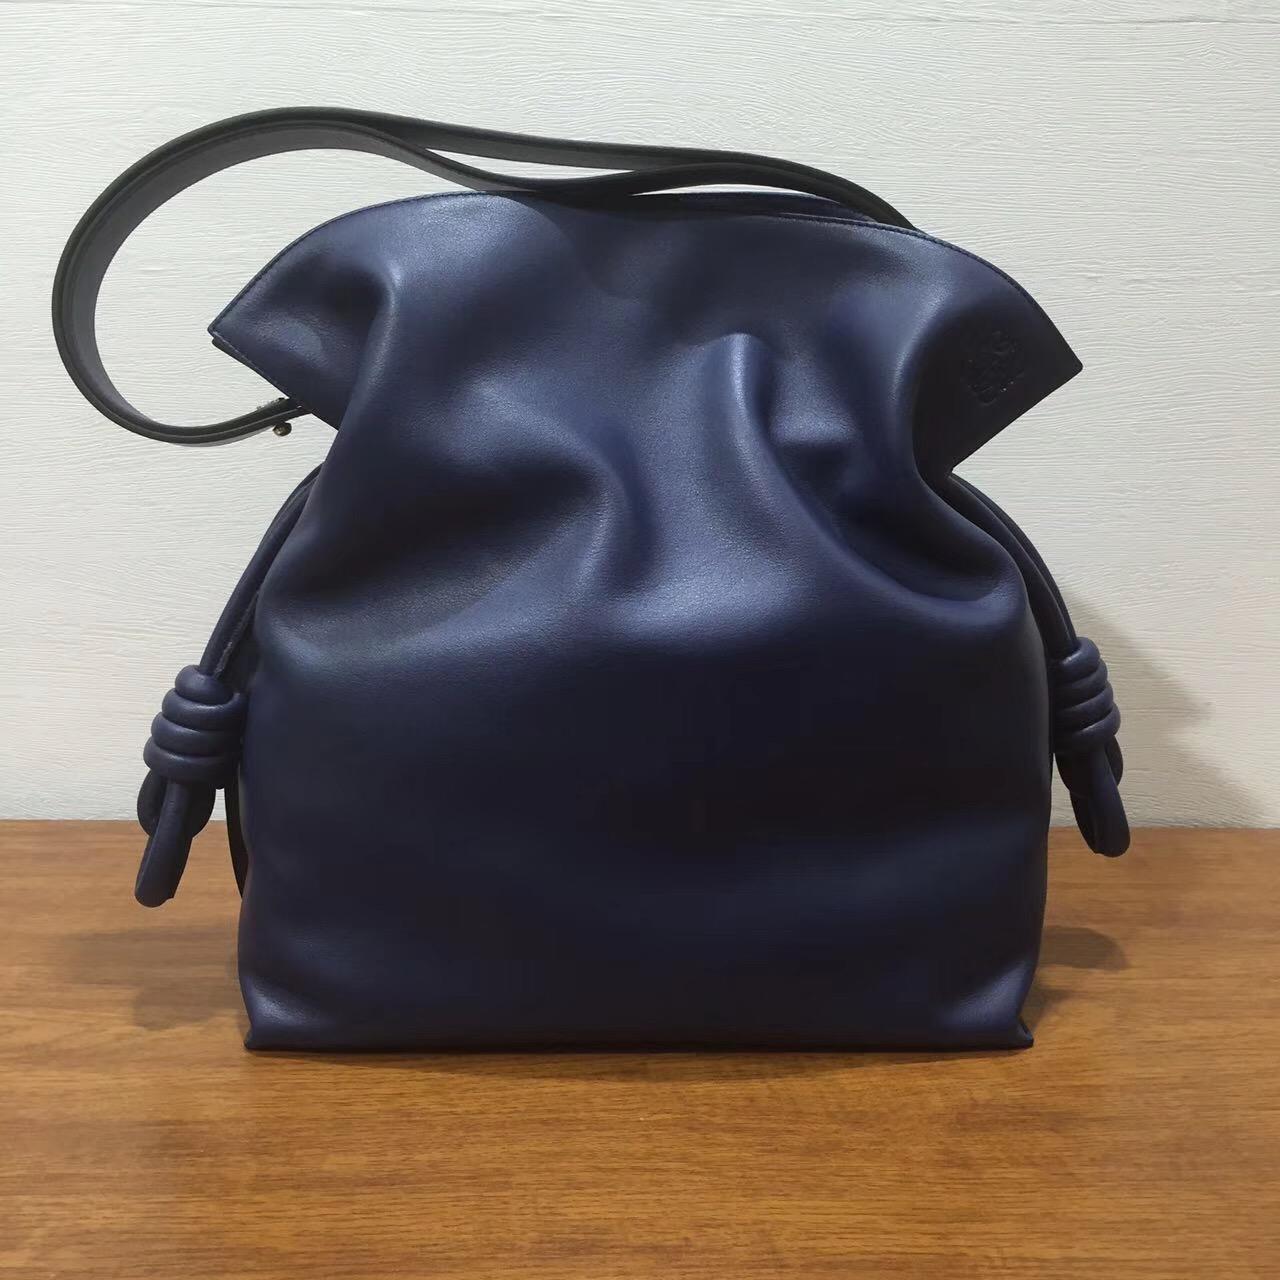 Loewe Flamenco绳结手袋 羅意威 Flamenco Knot Bag 靛蓝、深蓝色